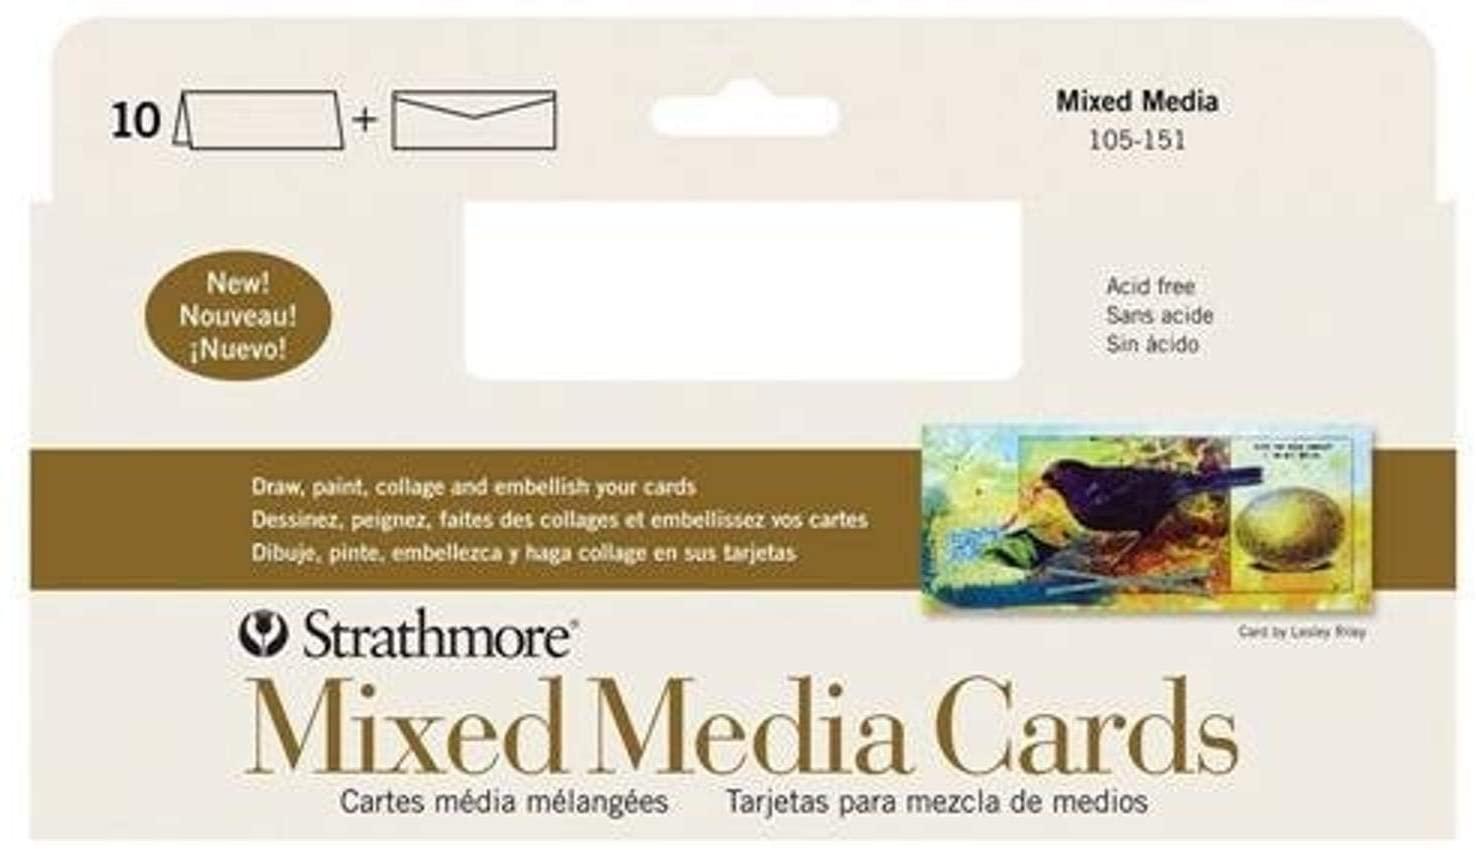 Strathmore 105-151-1 Mixed Media Slim Cards, 10 Cards & Envelopes